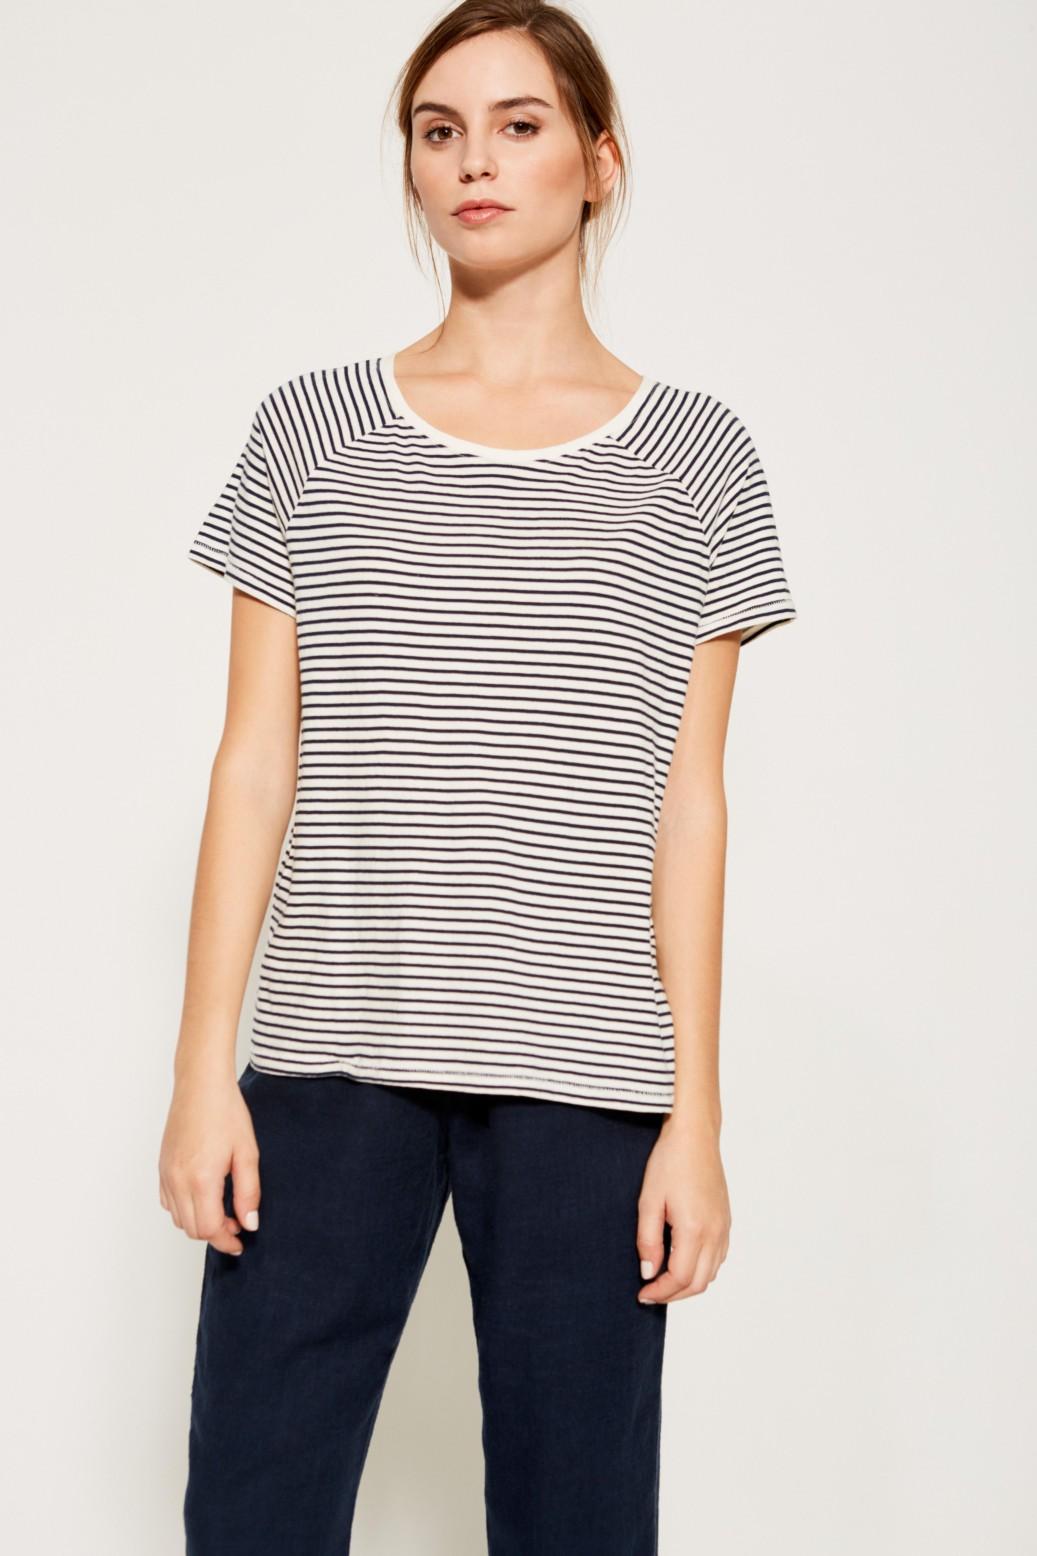 Set camisetas manga corta - Ítem3